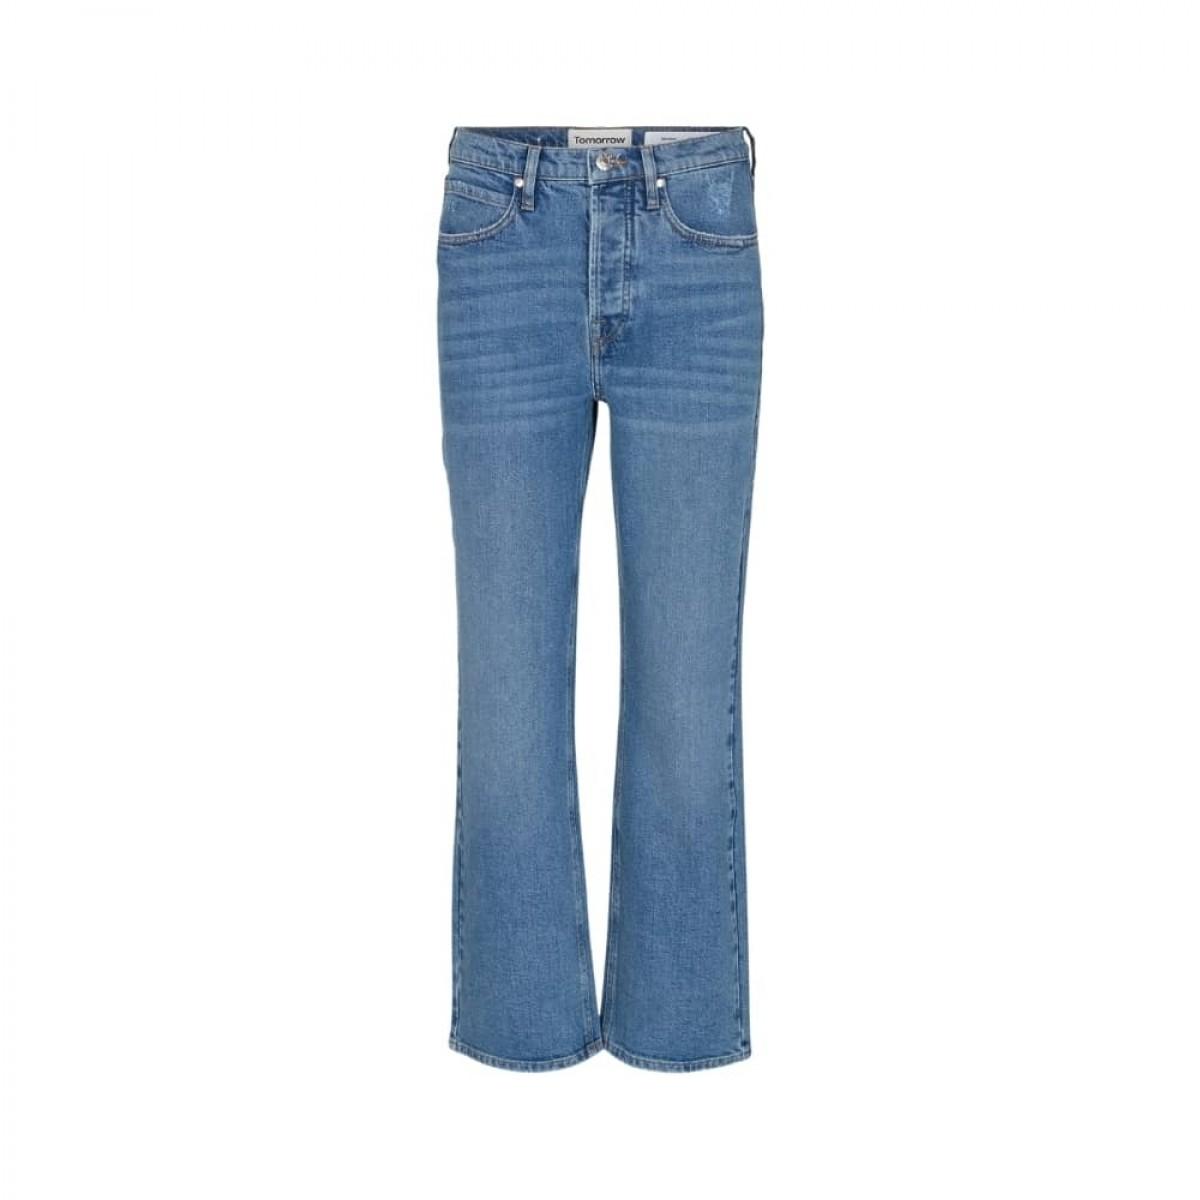 marston jeans - denim blue